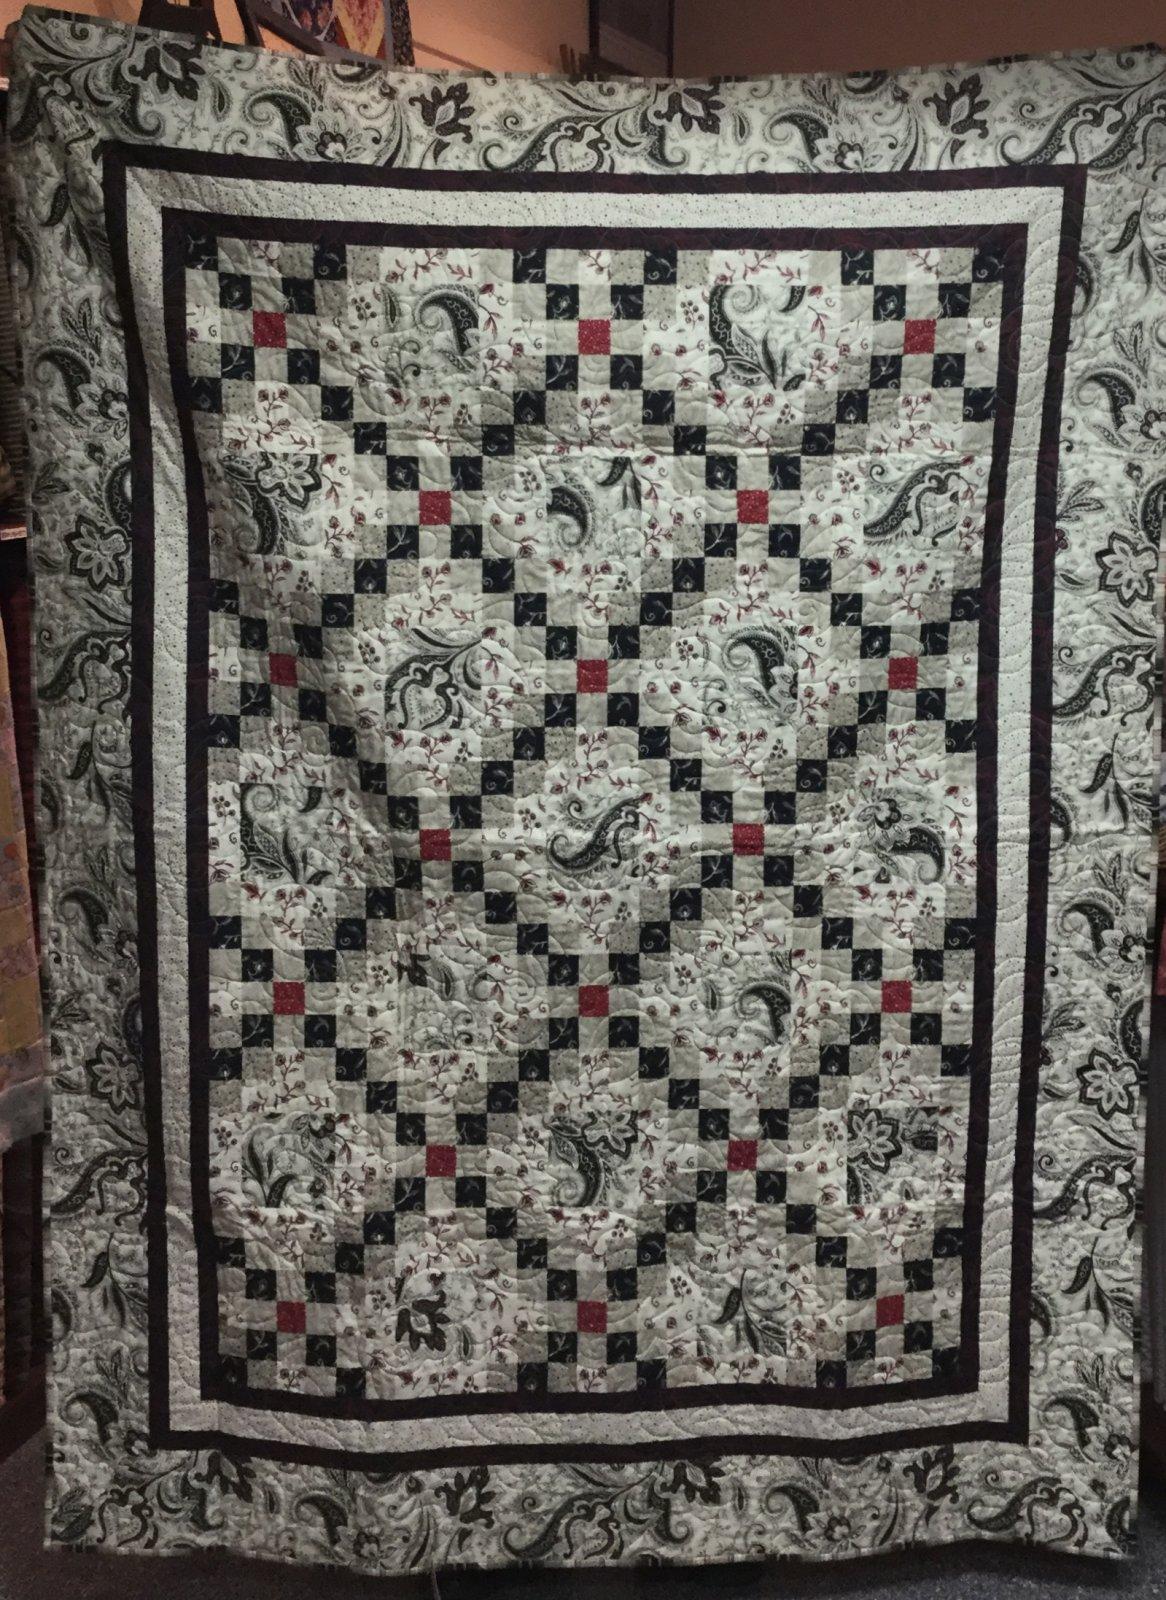 Red-Black-White Quilt (56 x 72)